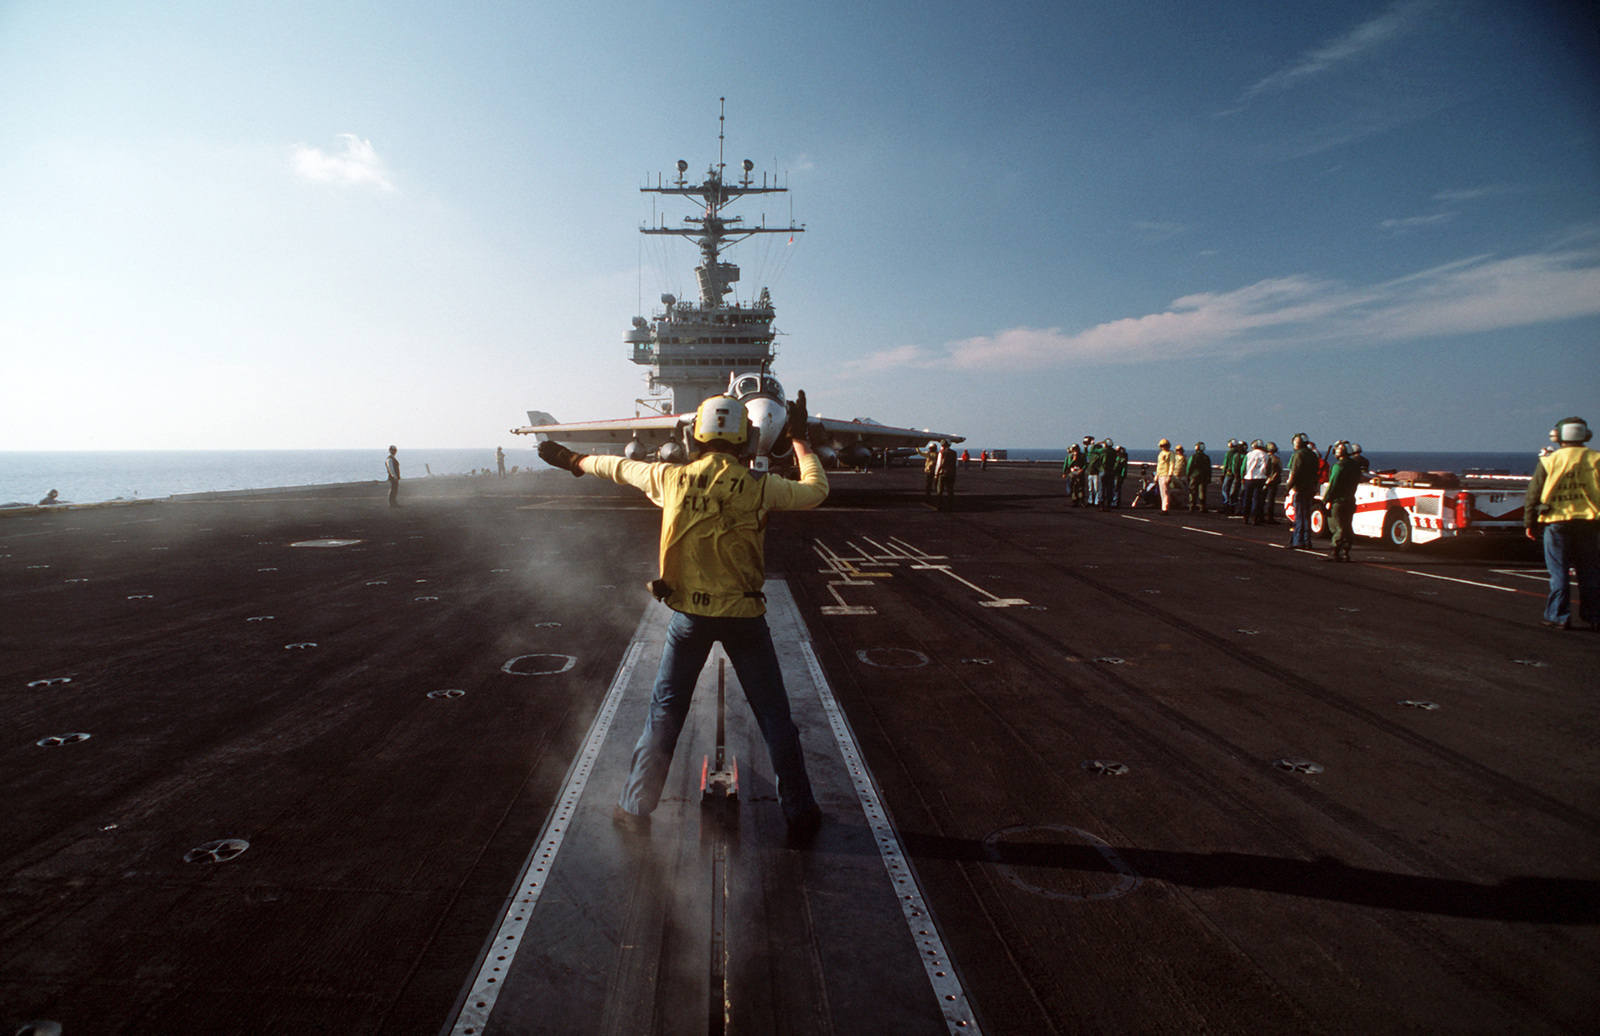 A plane director signals instructions to the pilot of an A-6E Intruder aircraft aboard the nuclear-powered aircraft carrier USS THEODORE ROOSEVELT (CVN 71)